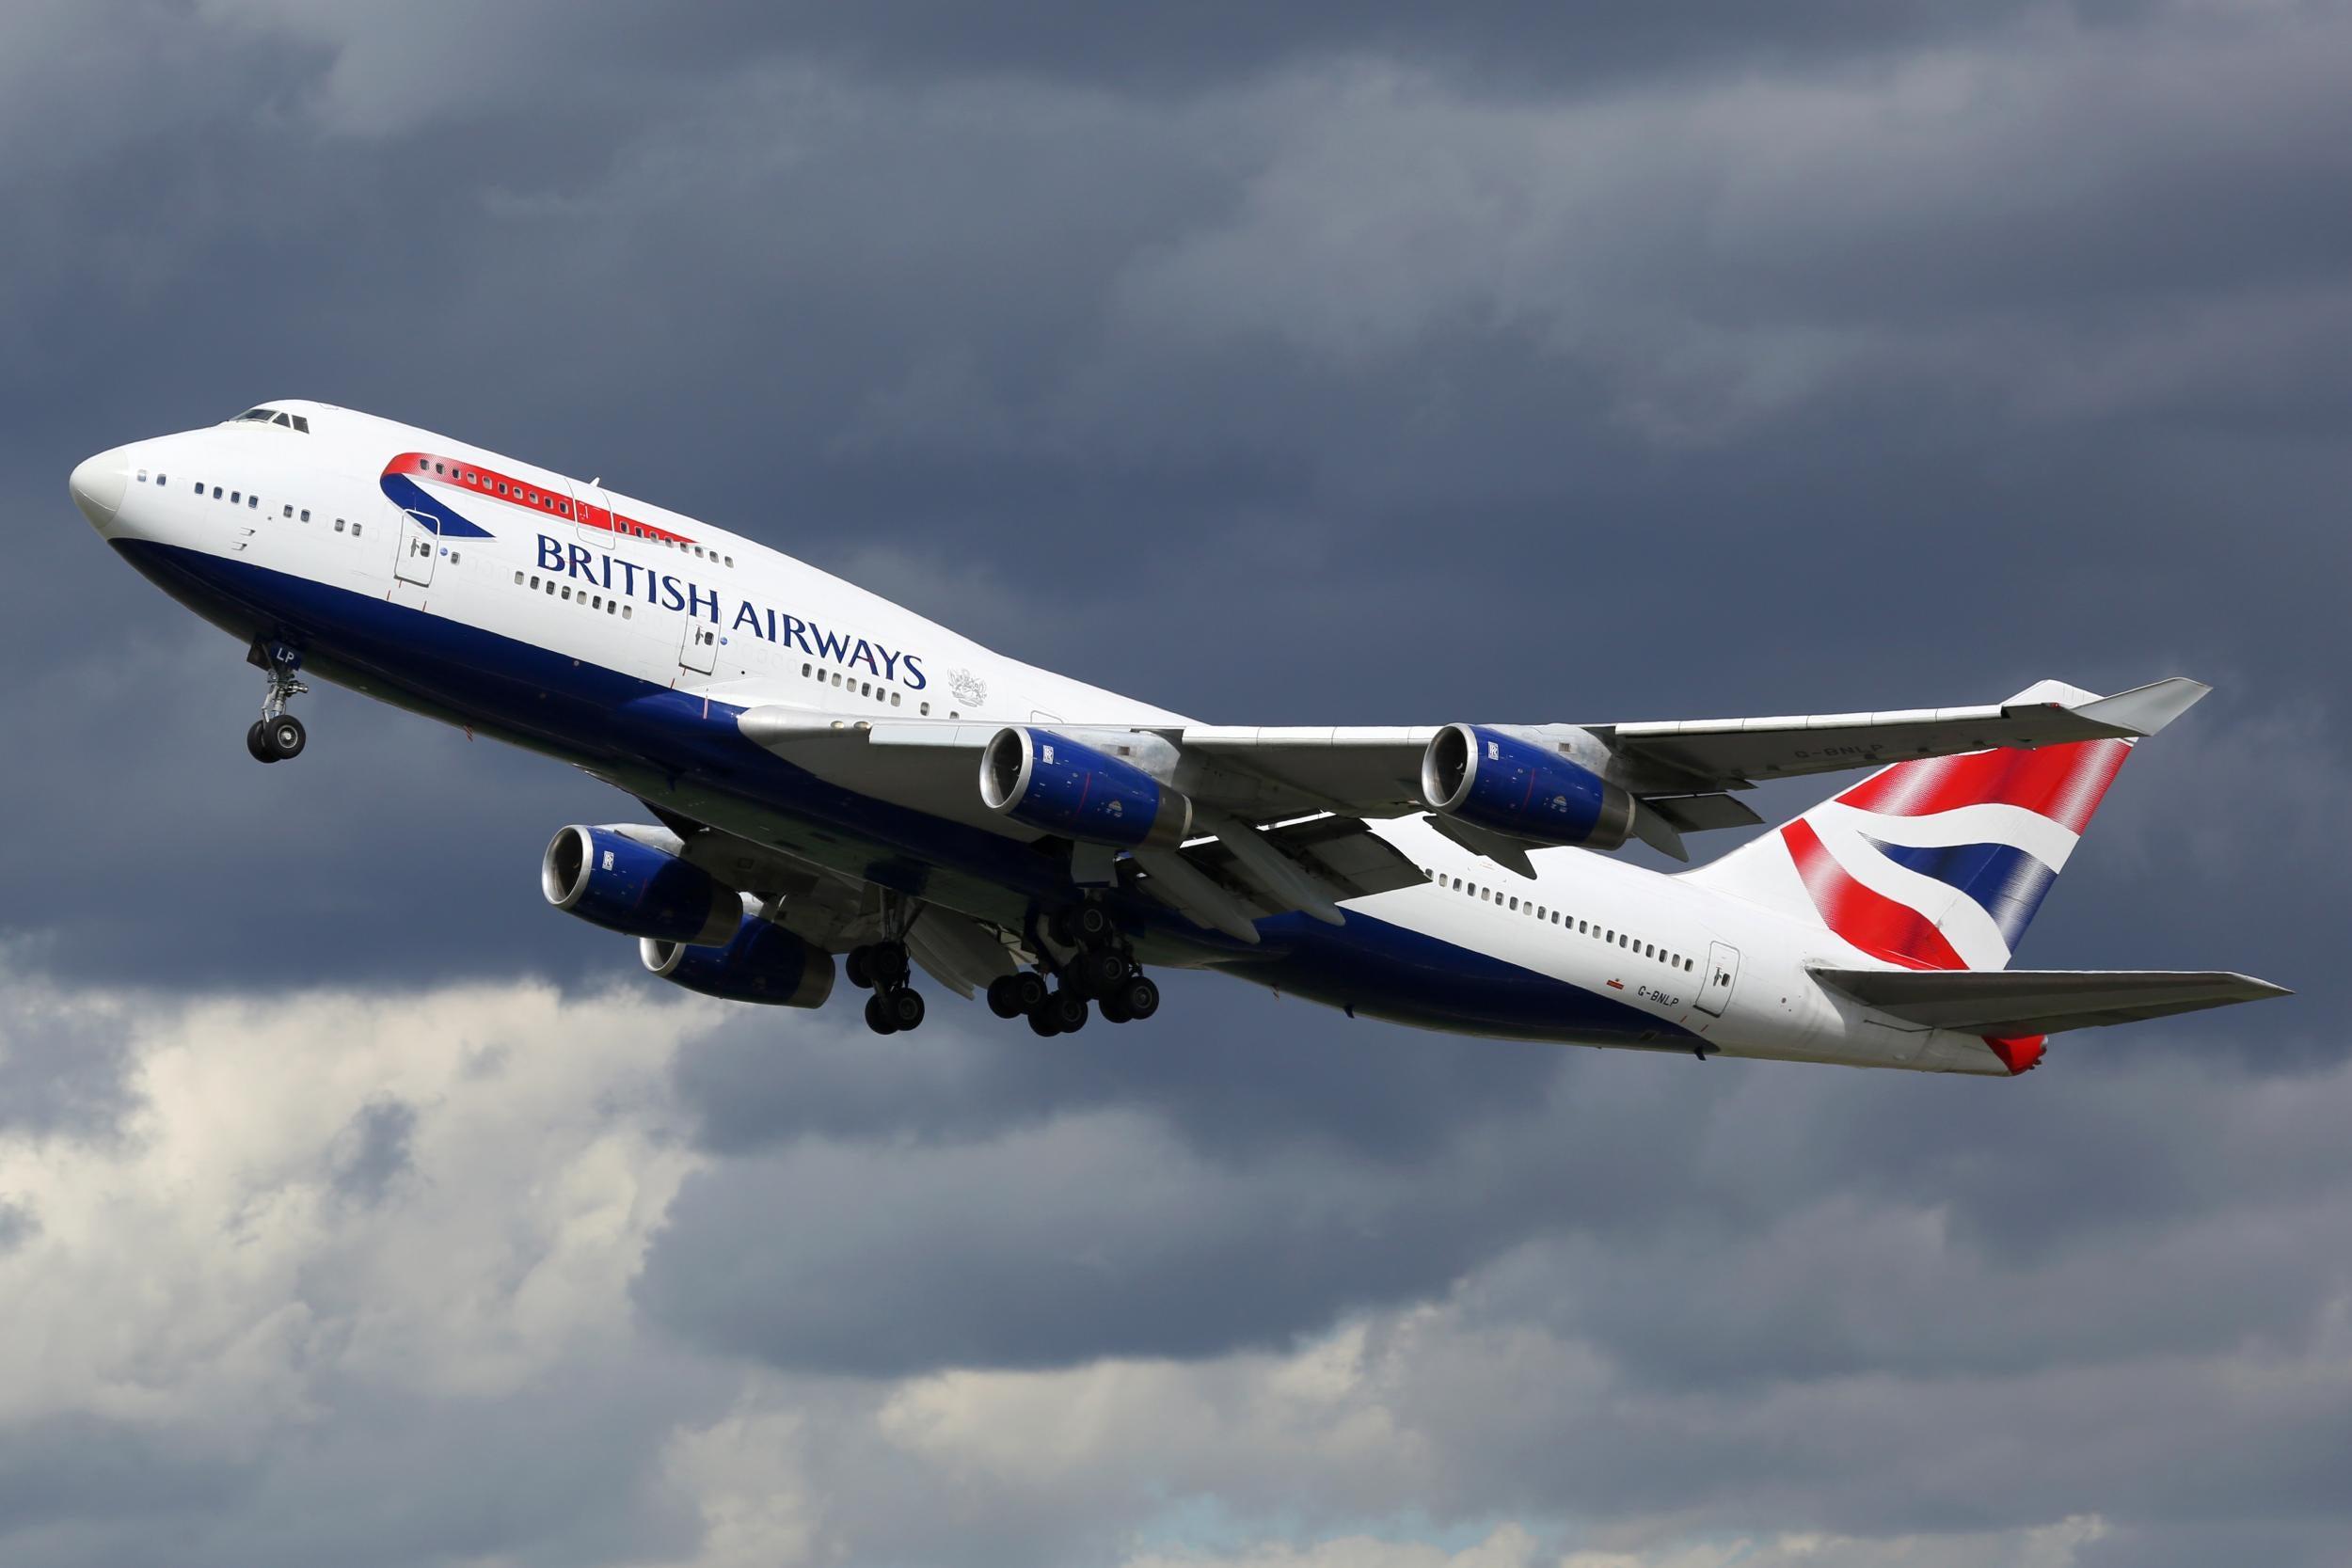 Video of British Airways flight battling strong crosswinds captured in Gibraltar